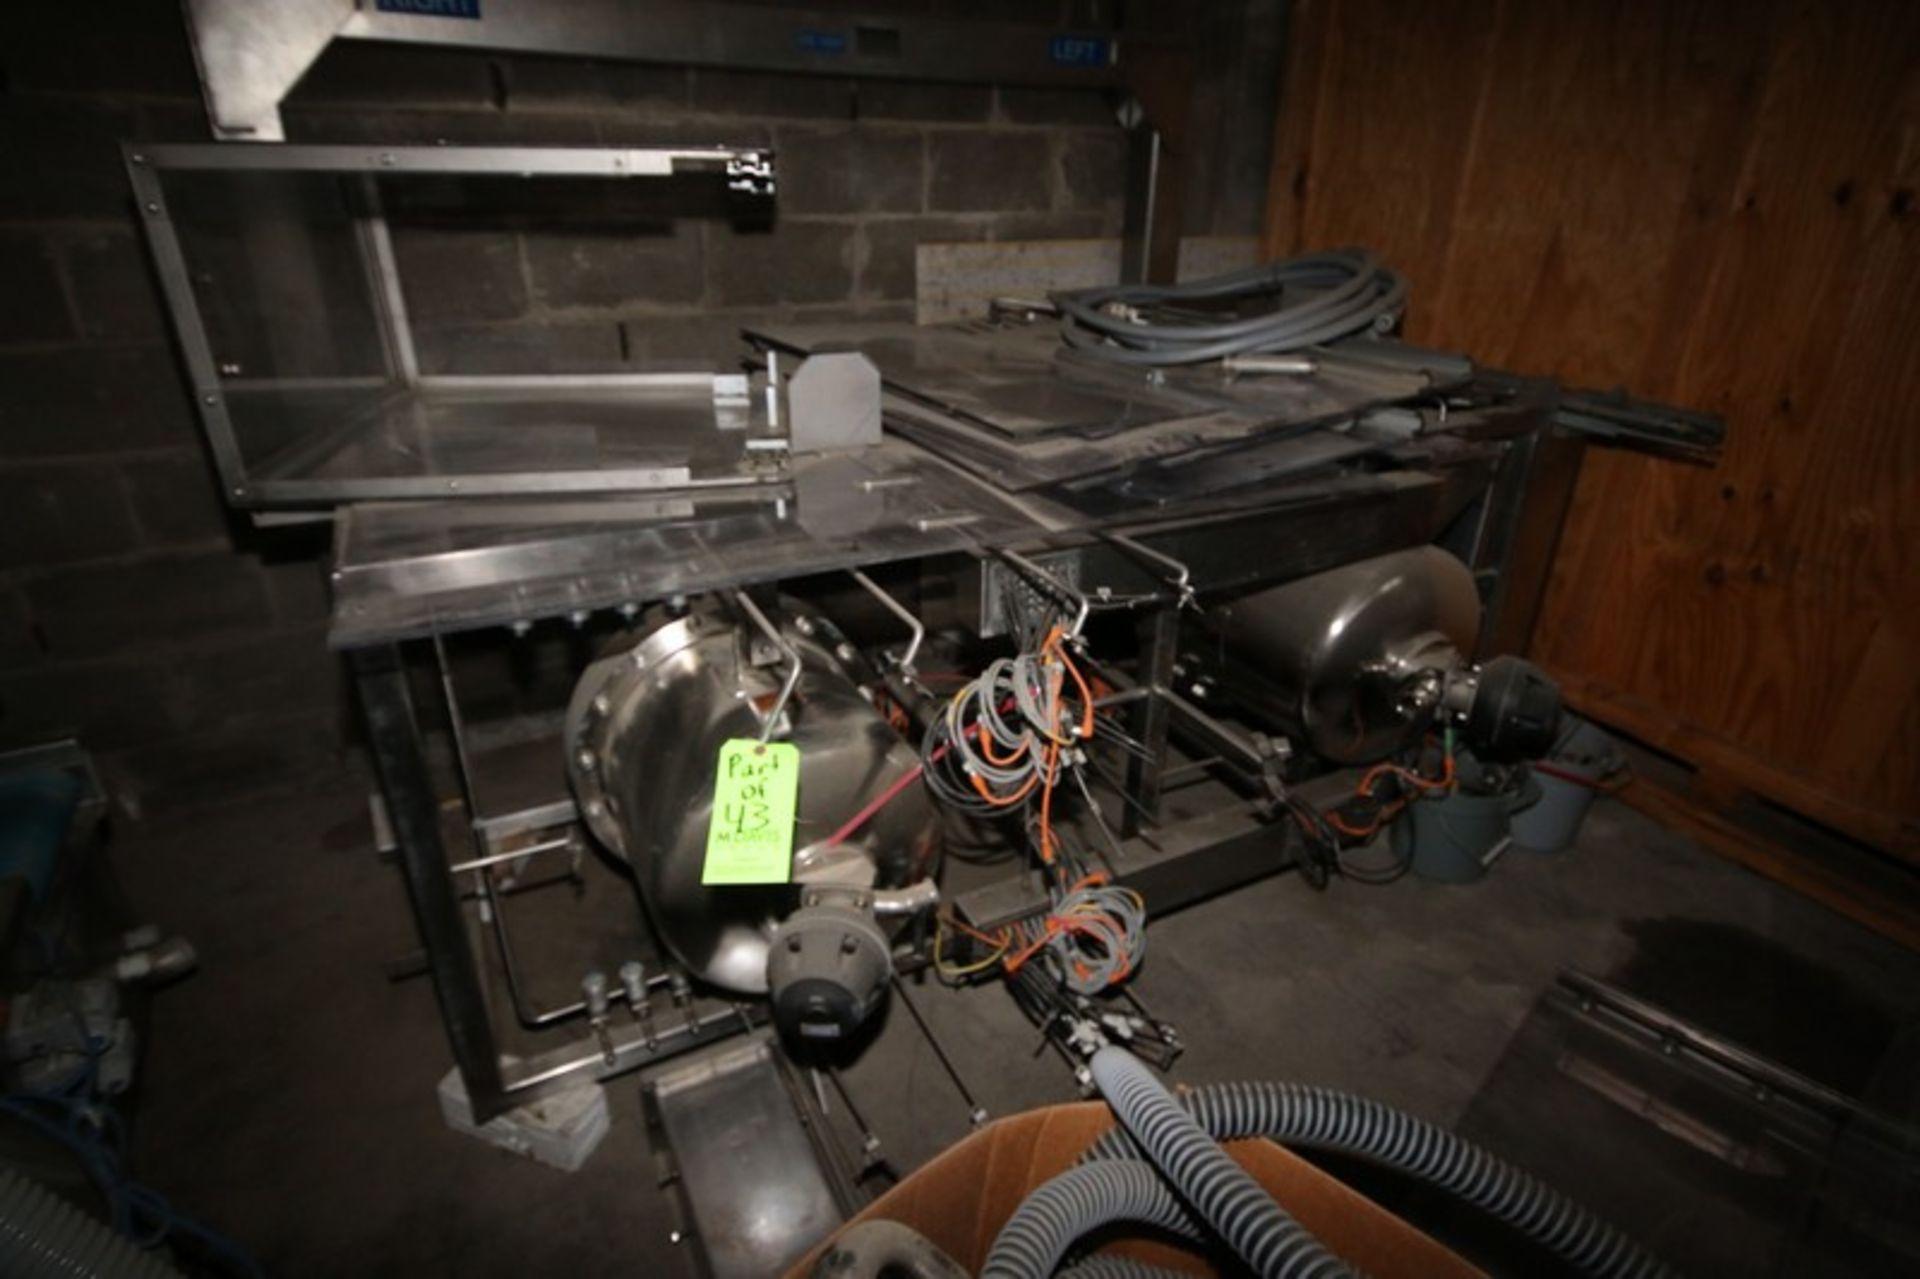 Lot 43 - Alphacos Dual Lane IV Filler, Type 526, S/N 526002, 7000 kg Weight Bag Capacity, S/S Frame (